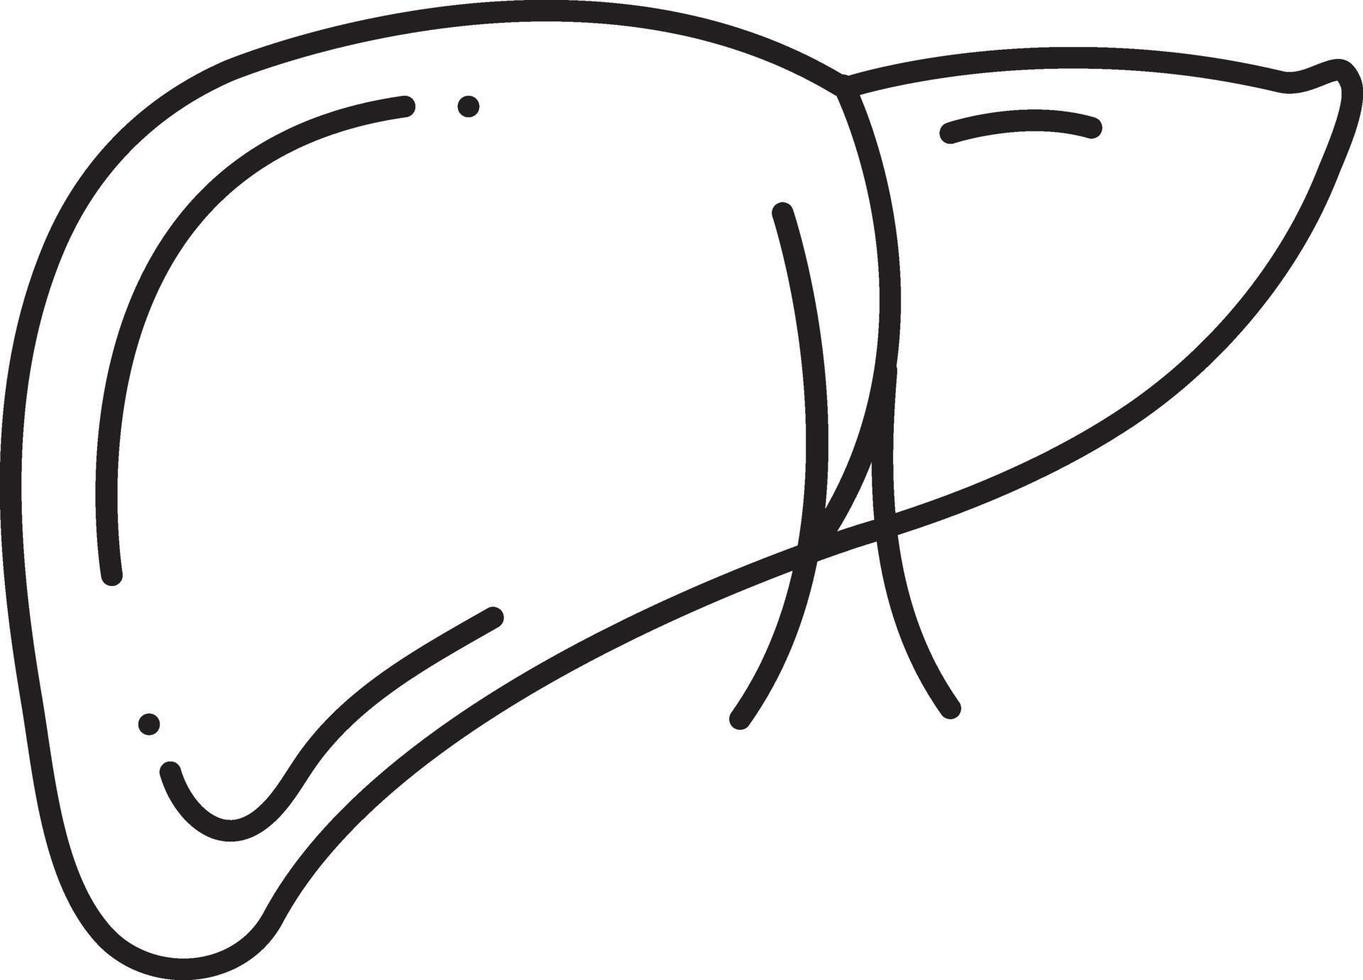 linje ikon för hepatologi vektor